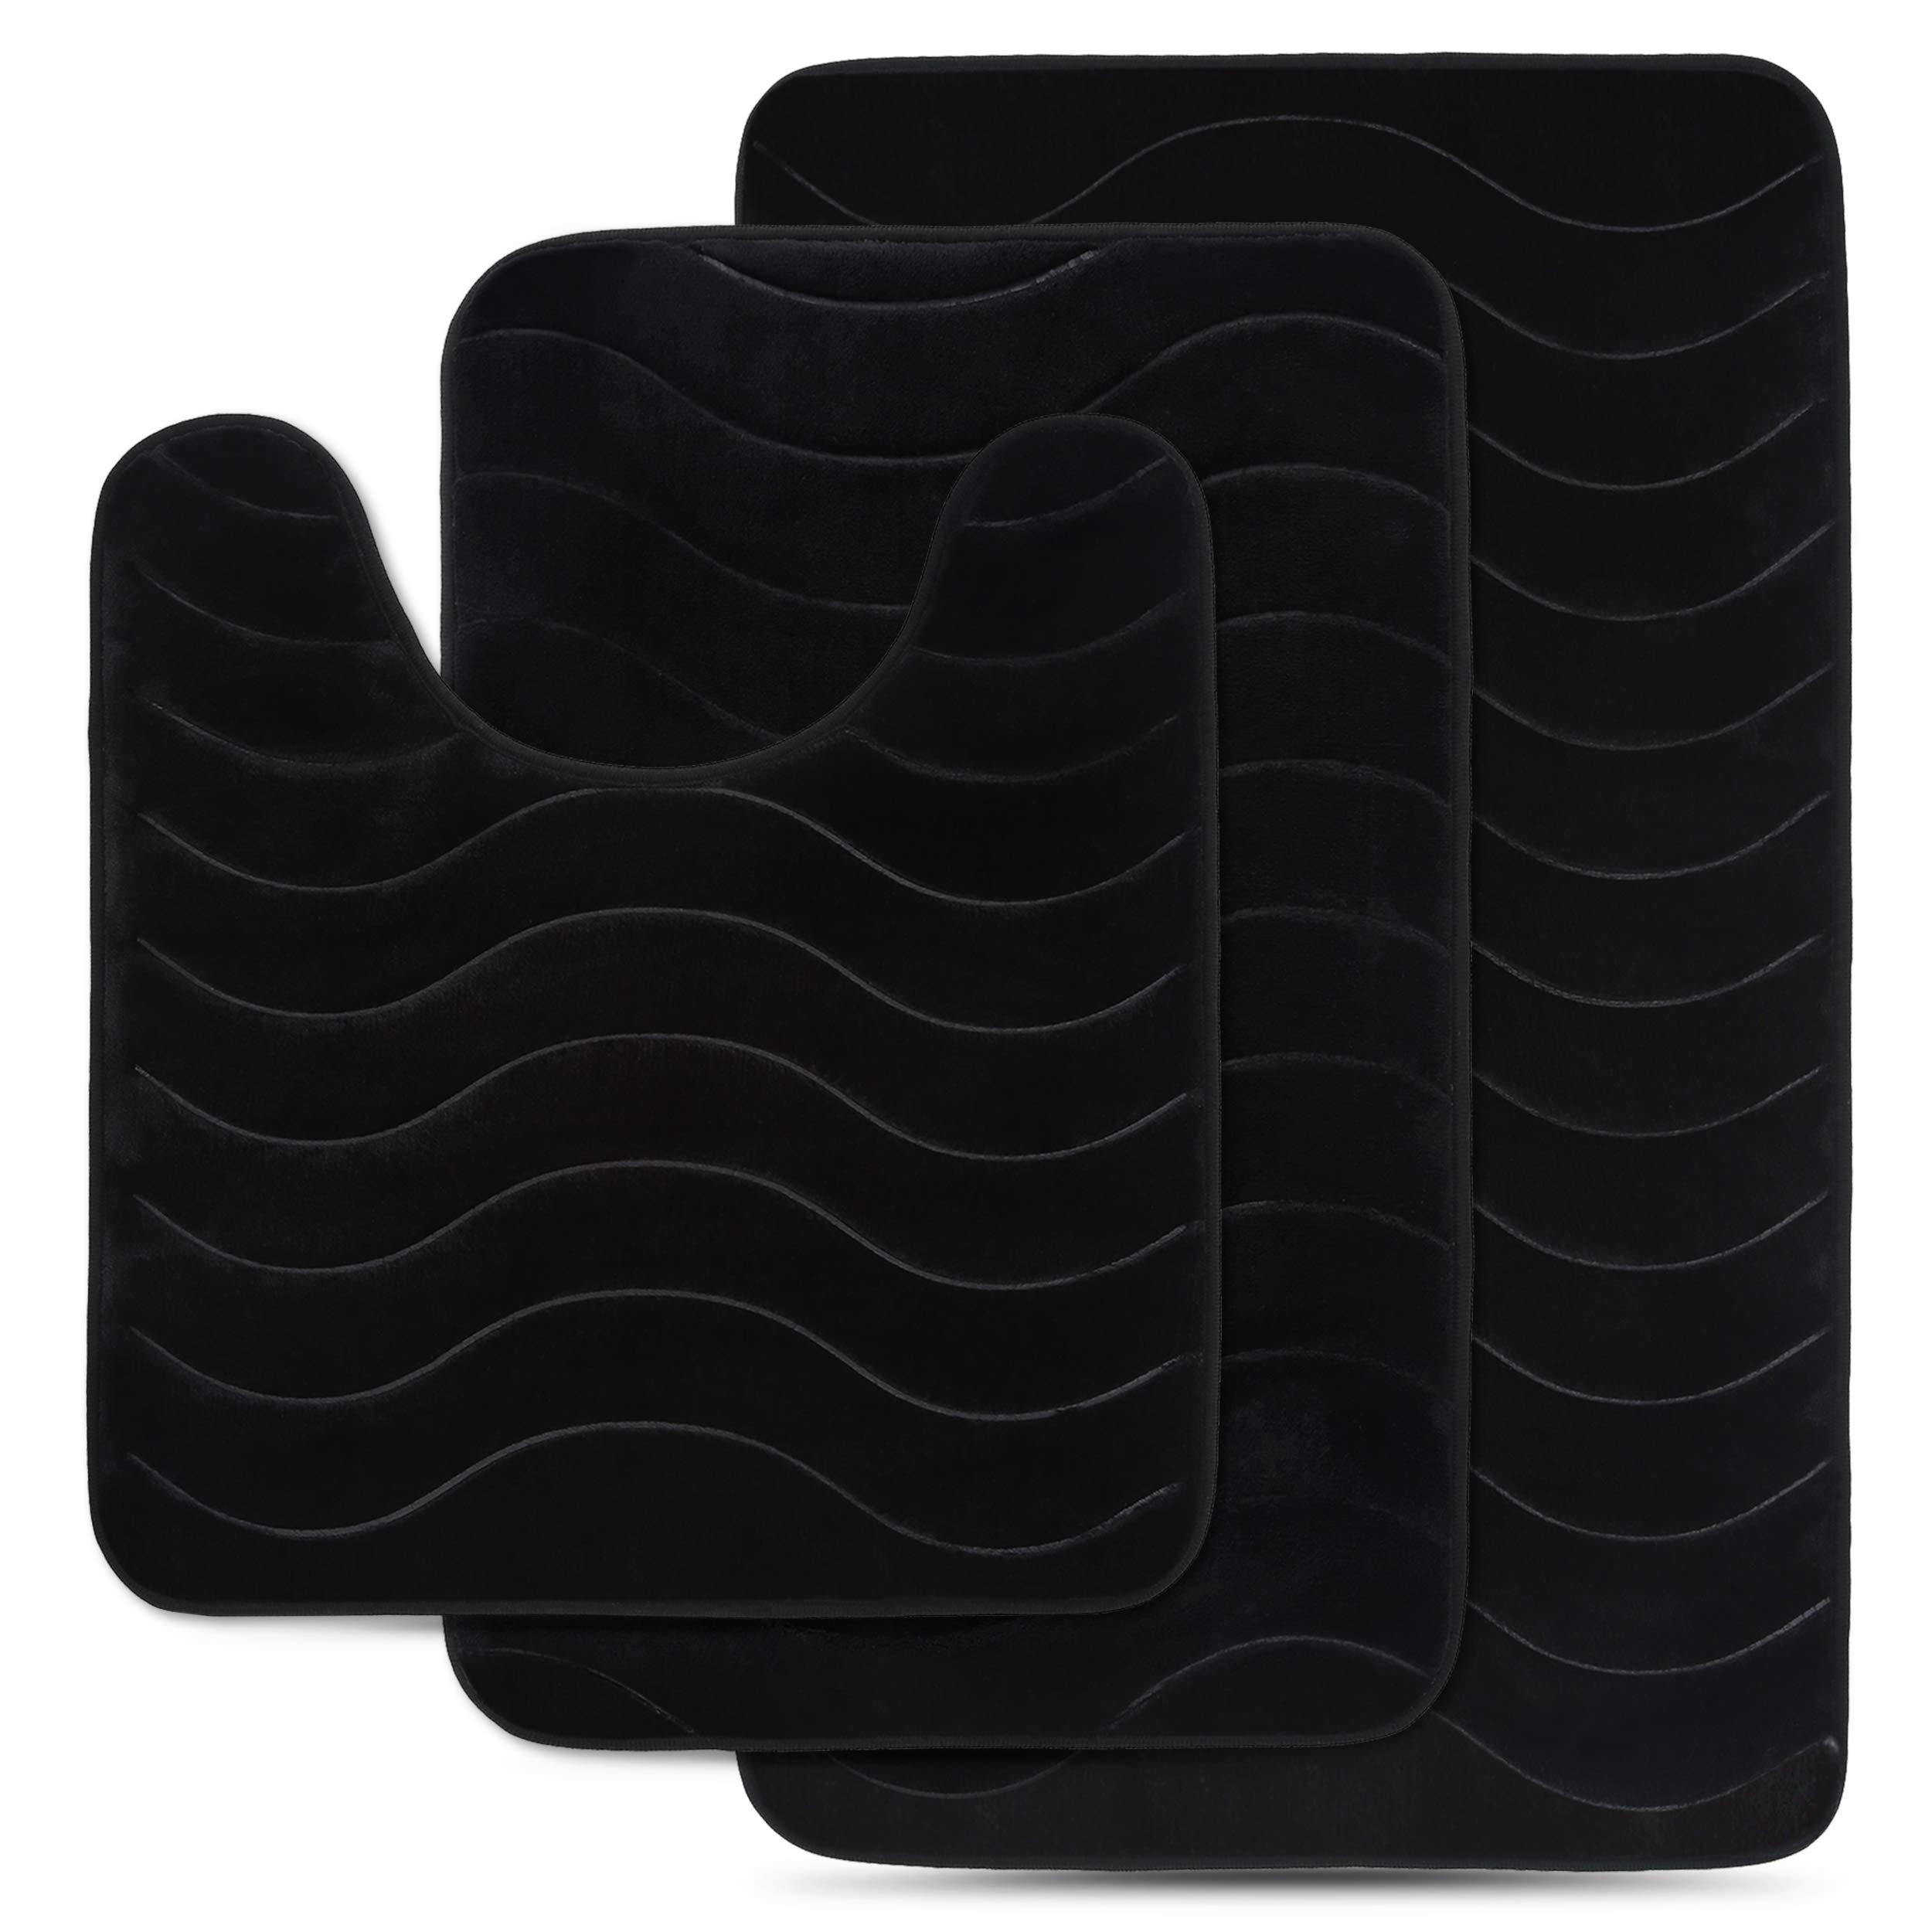 Effiliv 3 Piece Bathroom Rugs Set - Memory Foam Bath Mats, Black/Water Sea